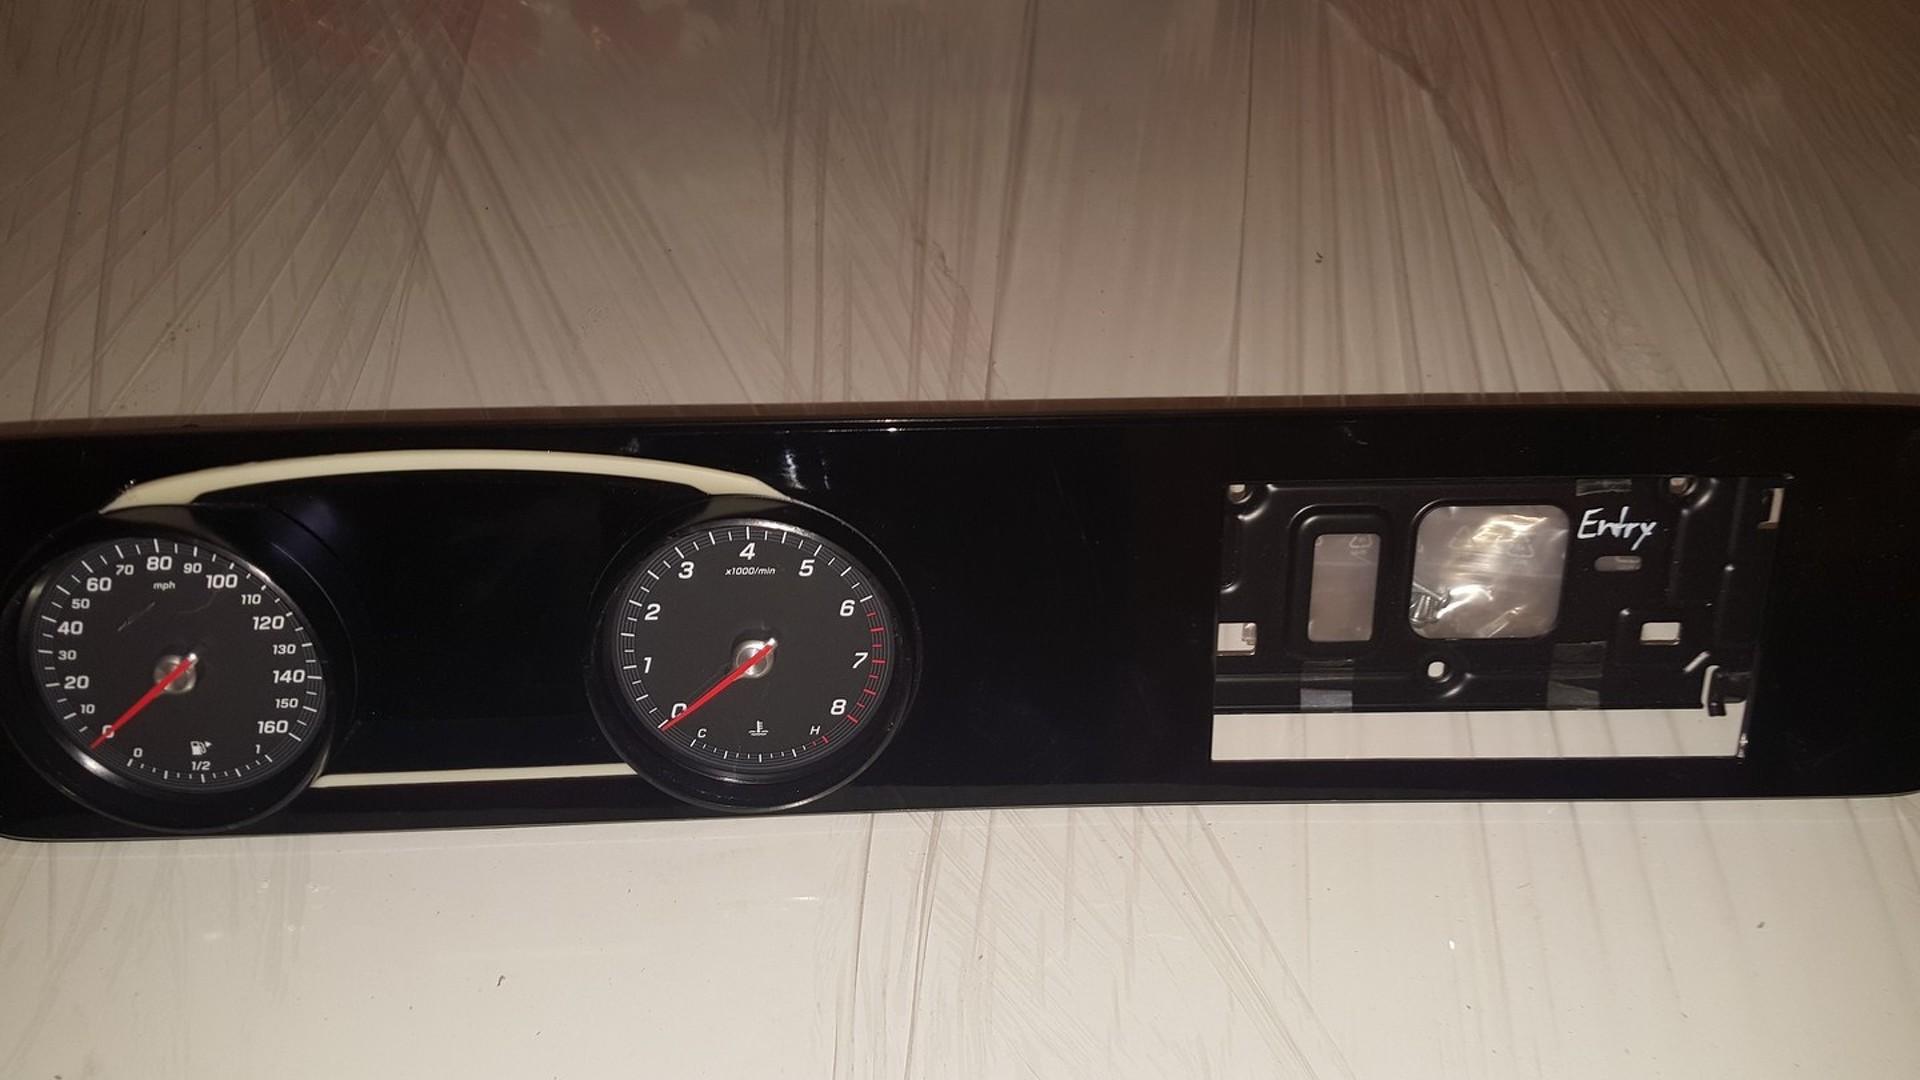 2016 Mercedes E Class base model dashboard panel hits eBay